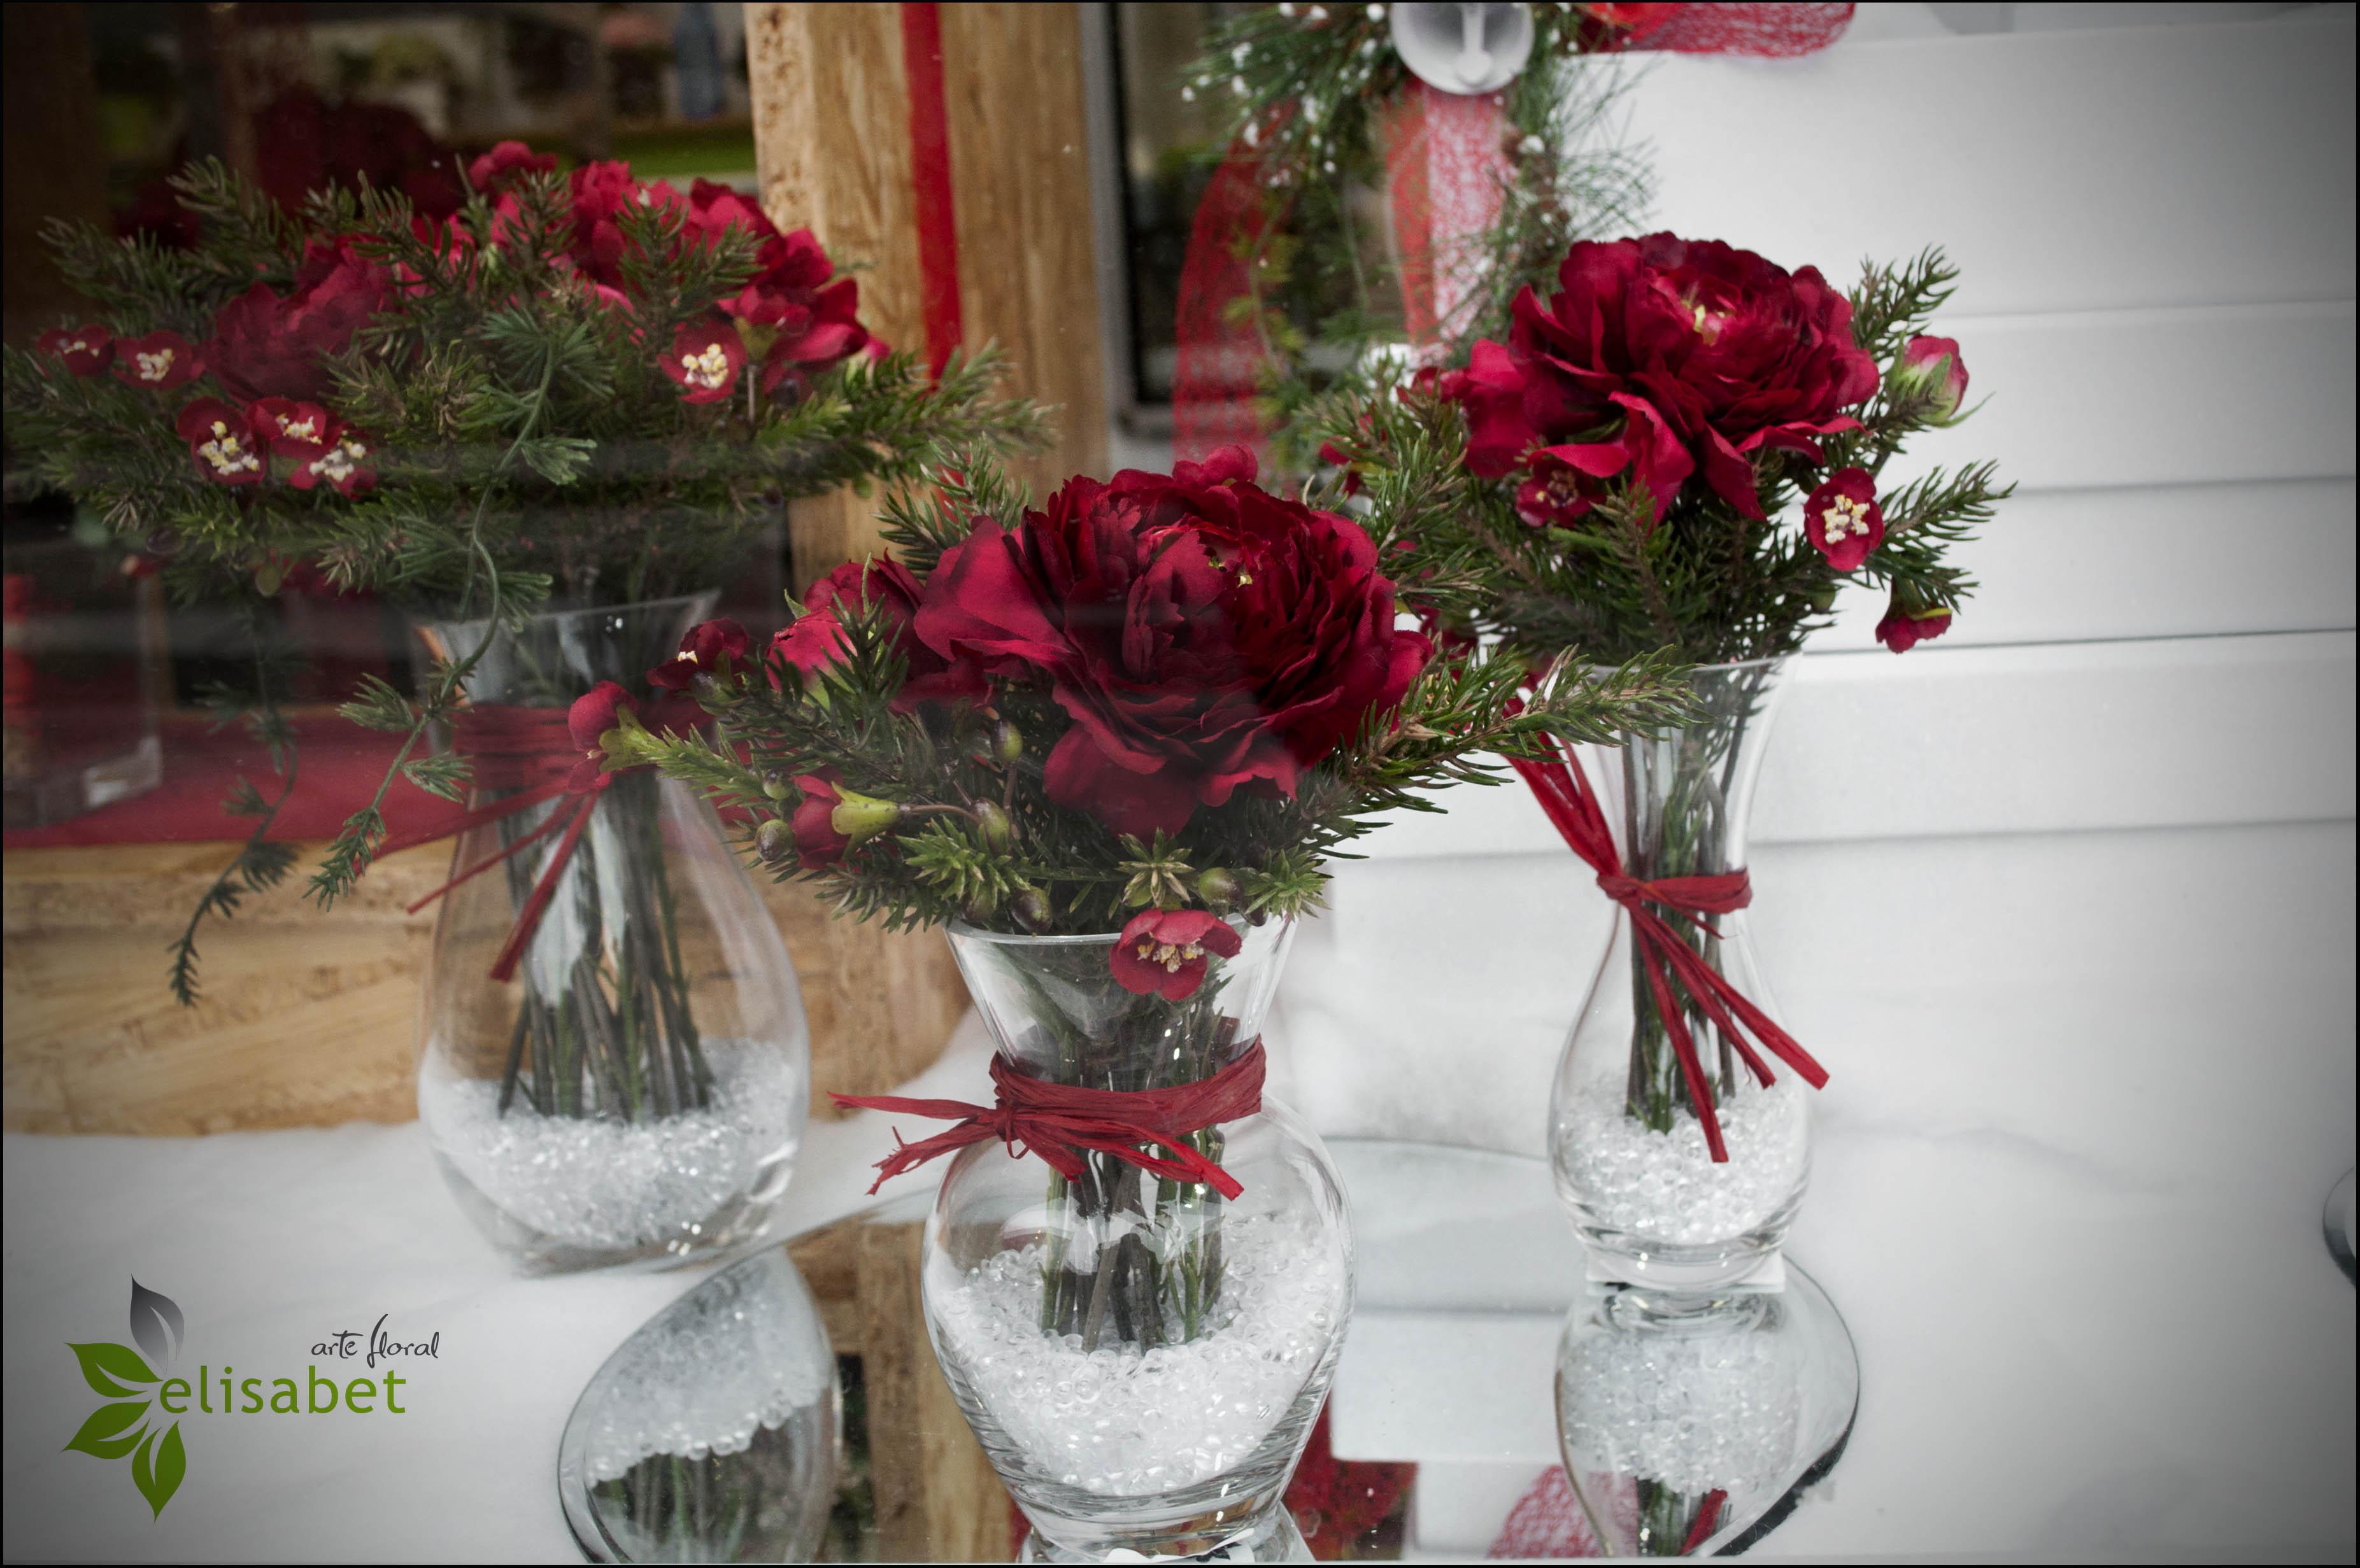 Ideas para decorar tu navidad elisabet arte floral blog - Centros navidenos de mesa ...